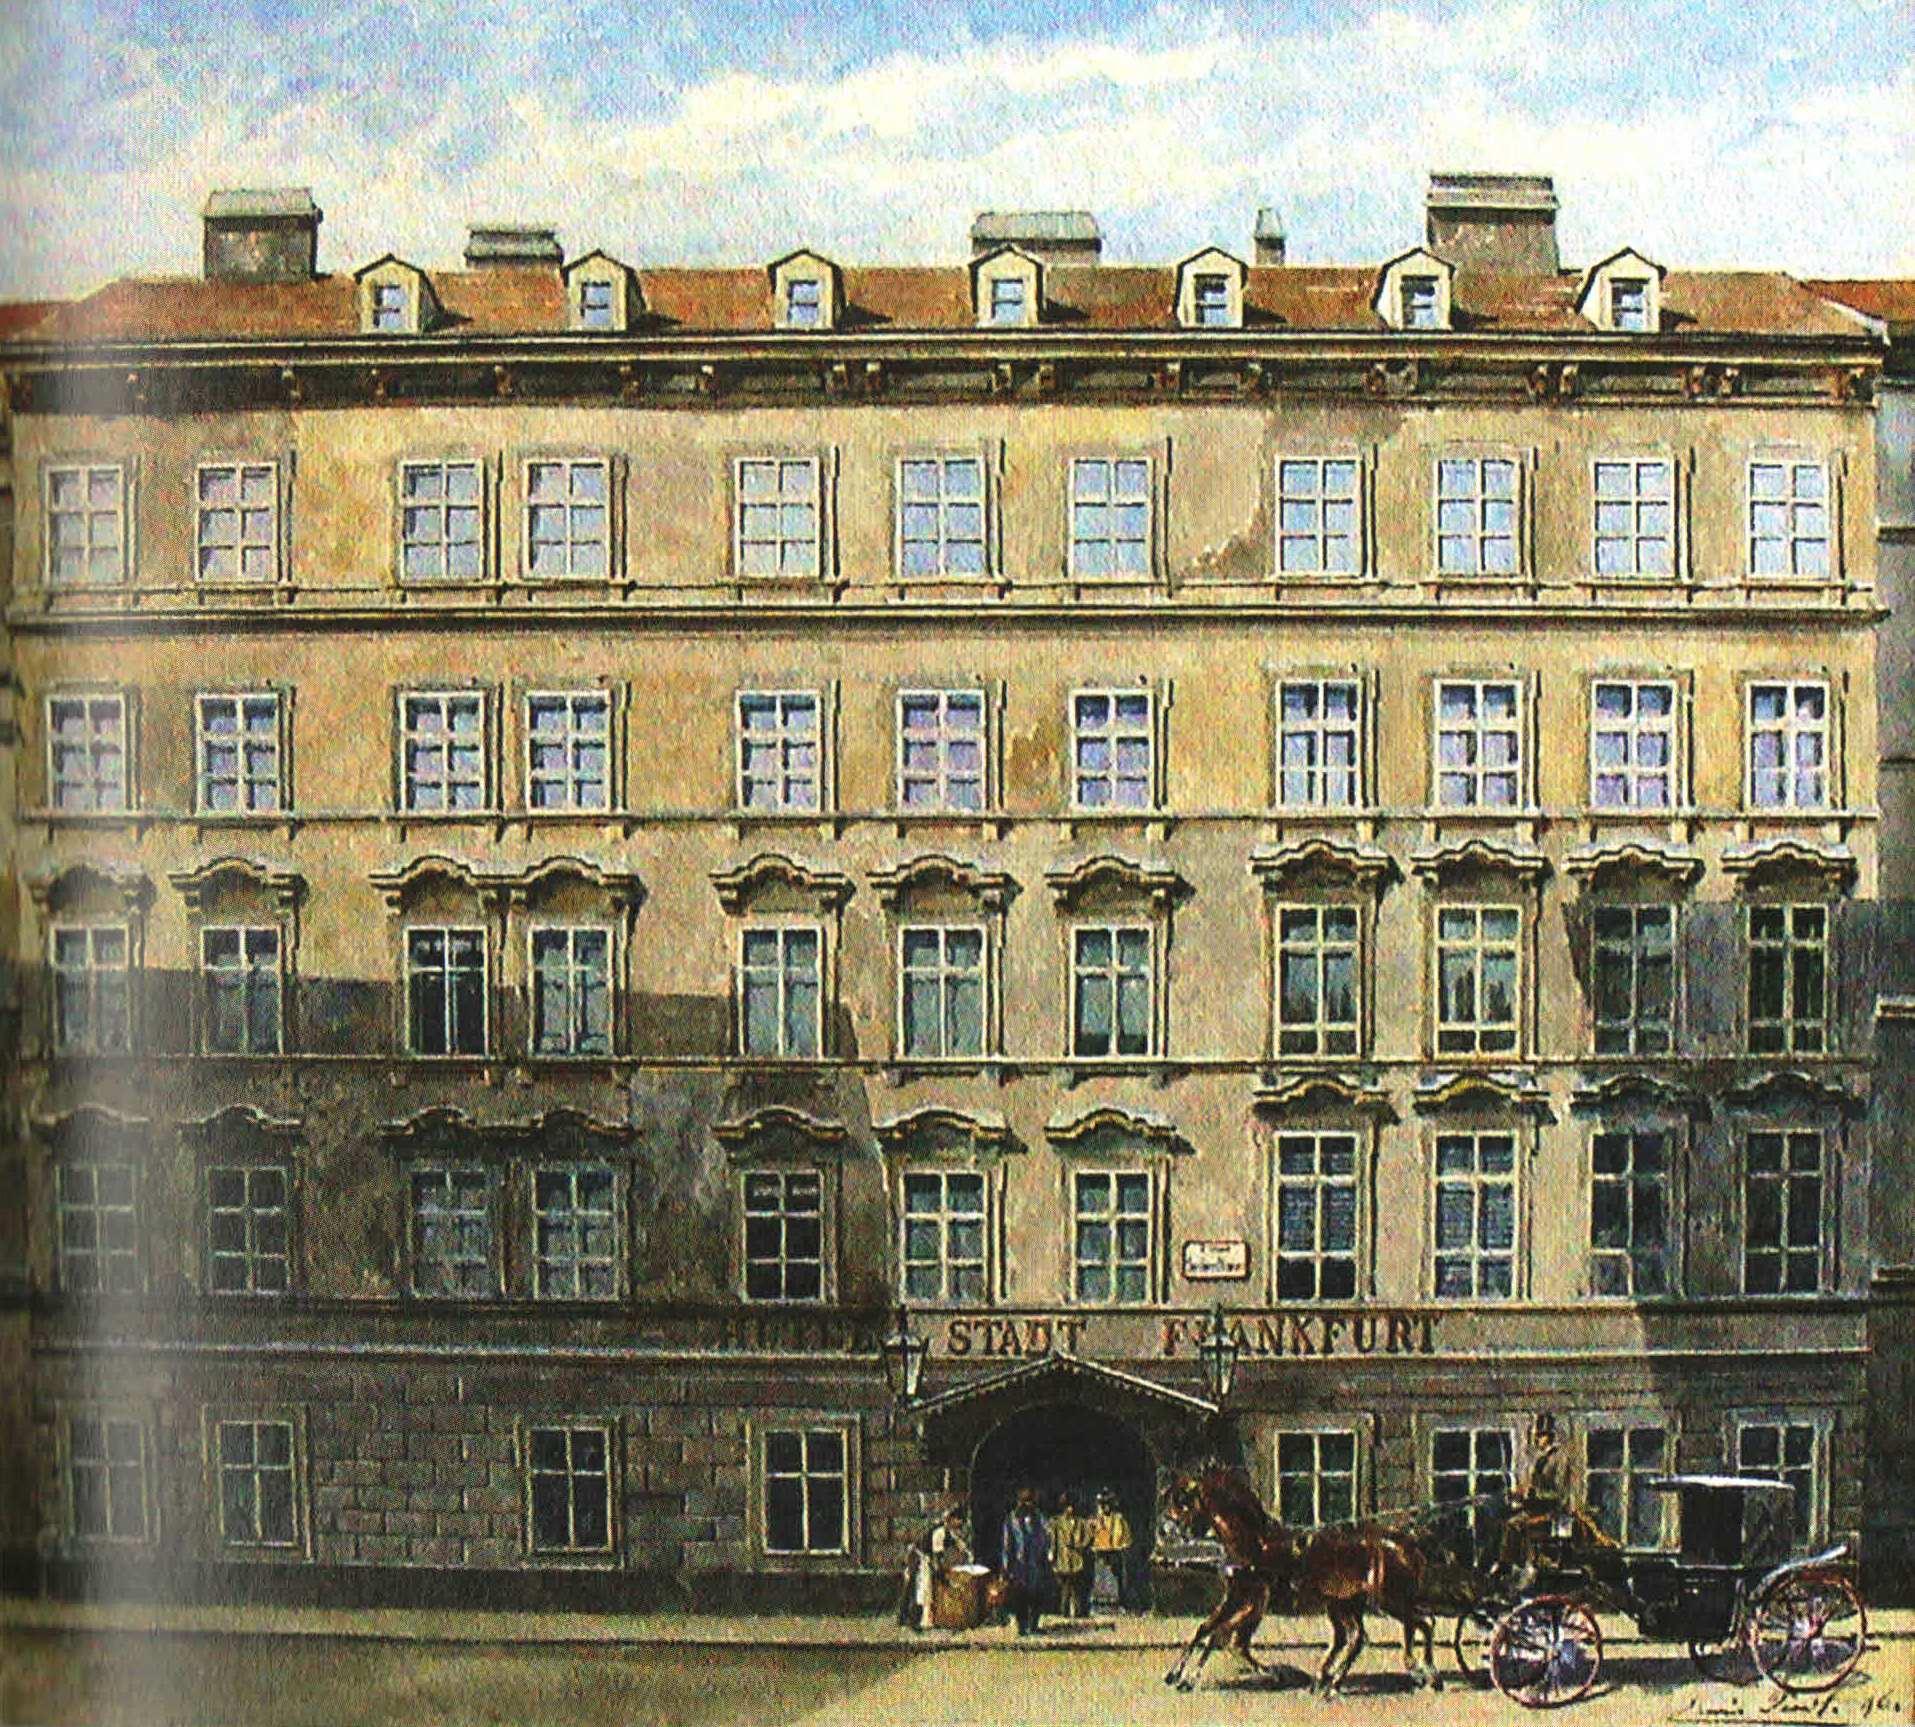 Bécs Hotel Frakfurt.jpg